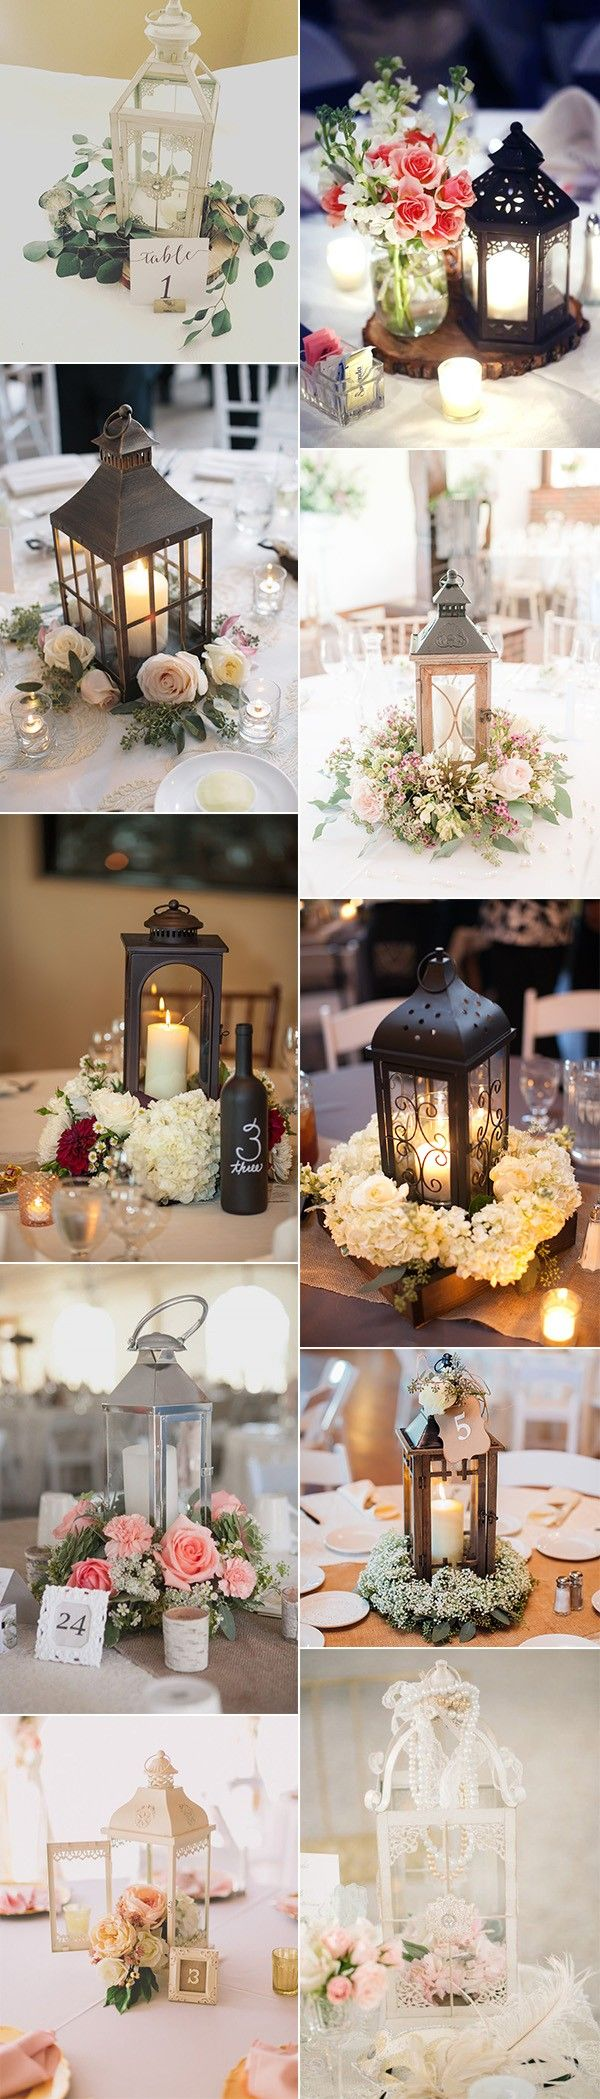 Wedding ideas with lanterns   Fabulous Vintage Wedding Centerpiece Decoration Ideas  Vintage